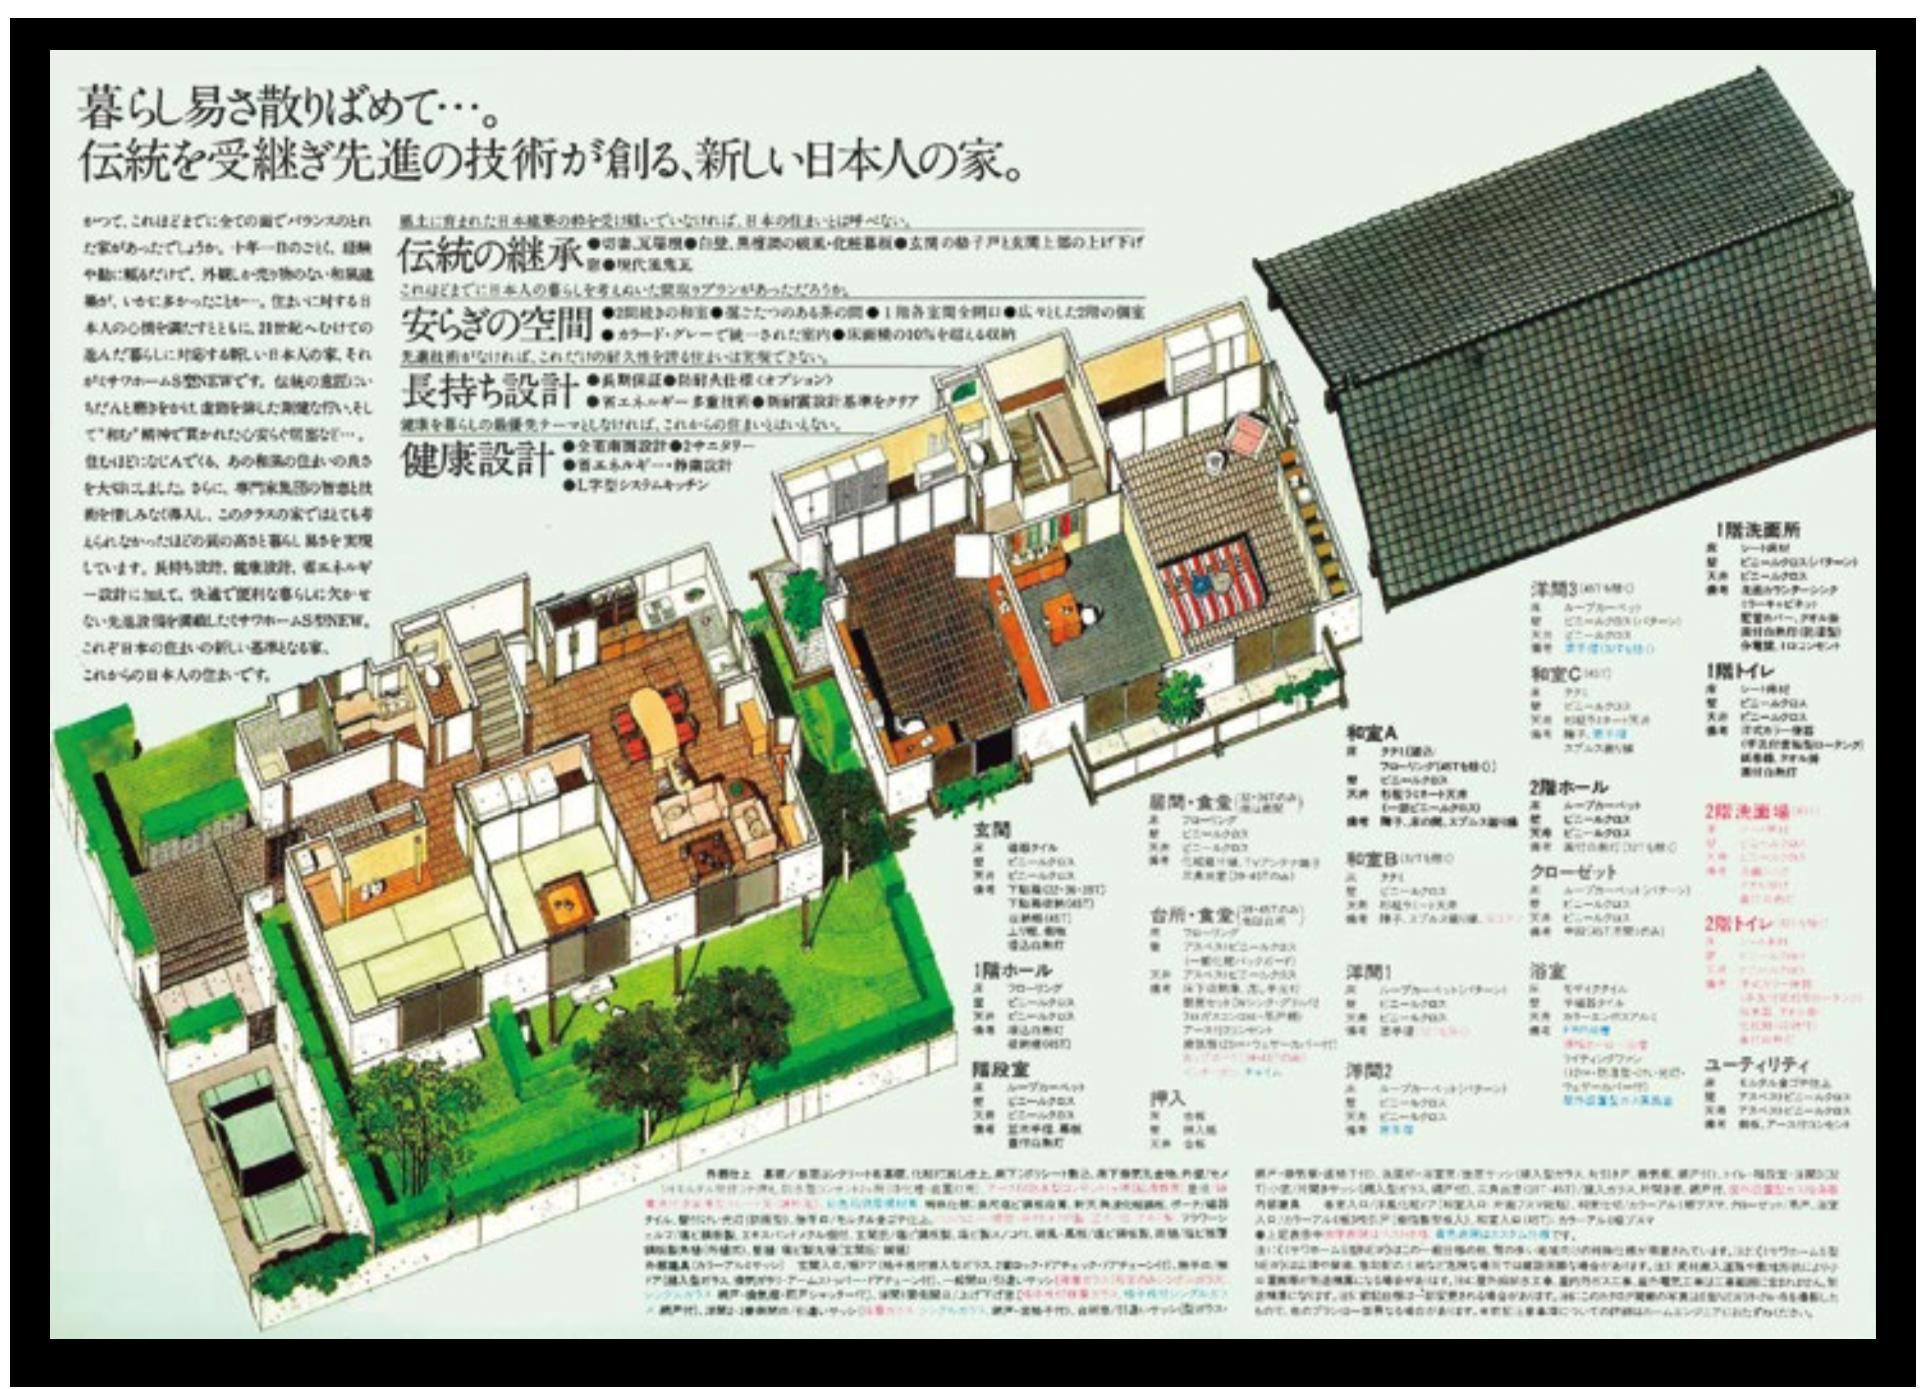 健康設計(S型NEW、1982年)